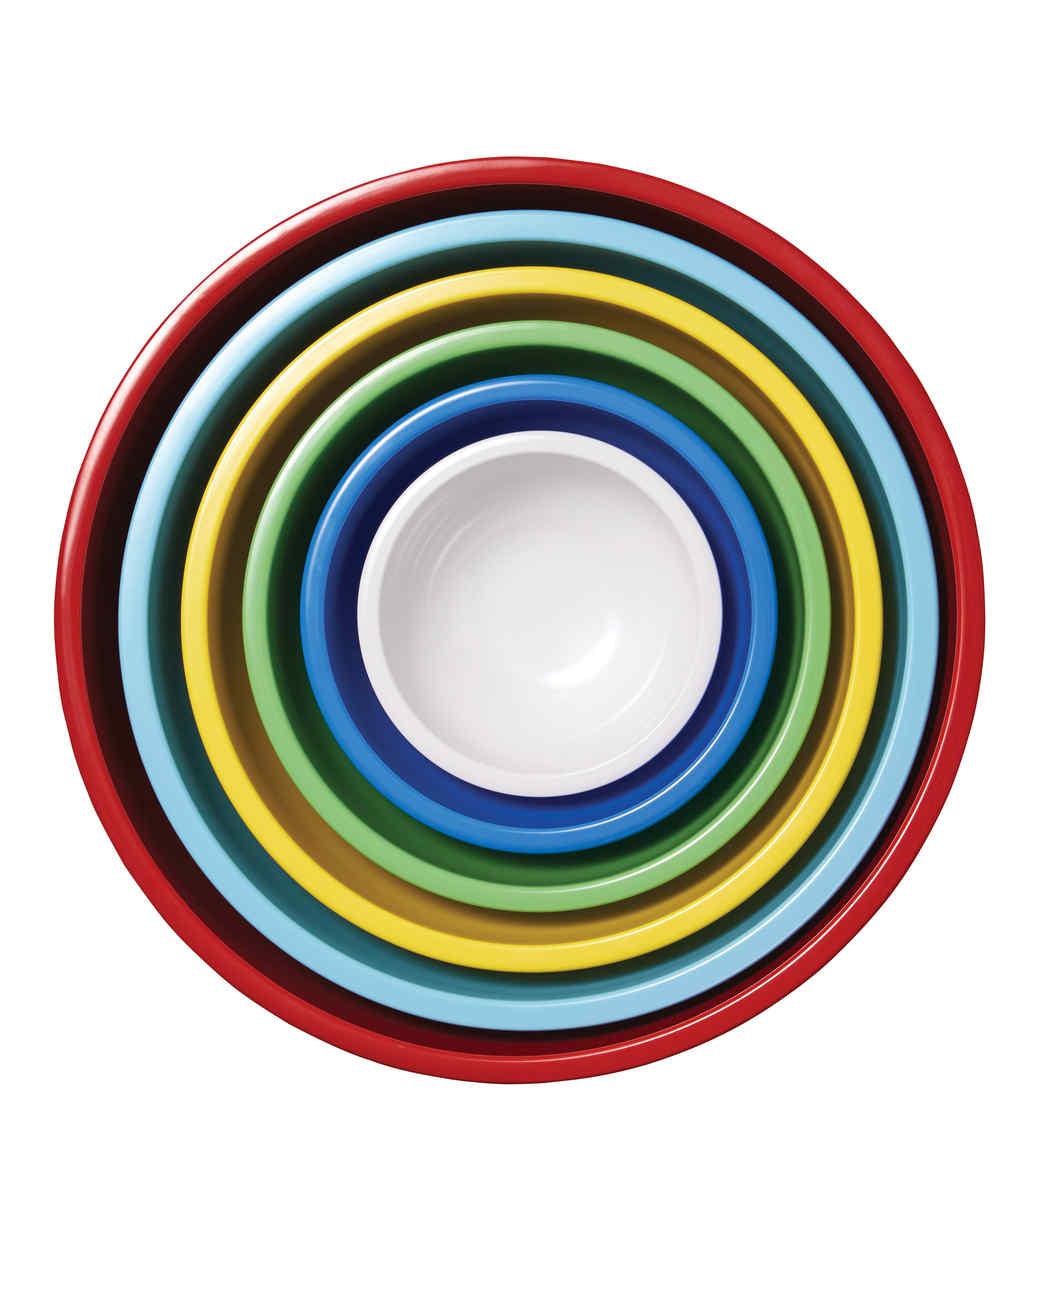 martha-nesting-bowls-5308-d112774-l-0416.jpg